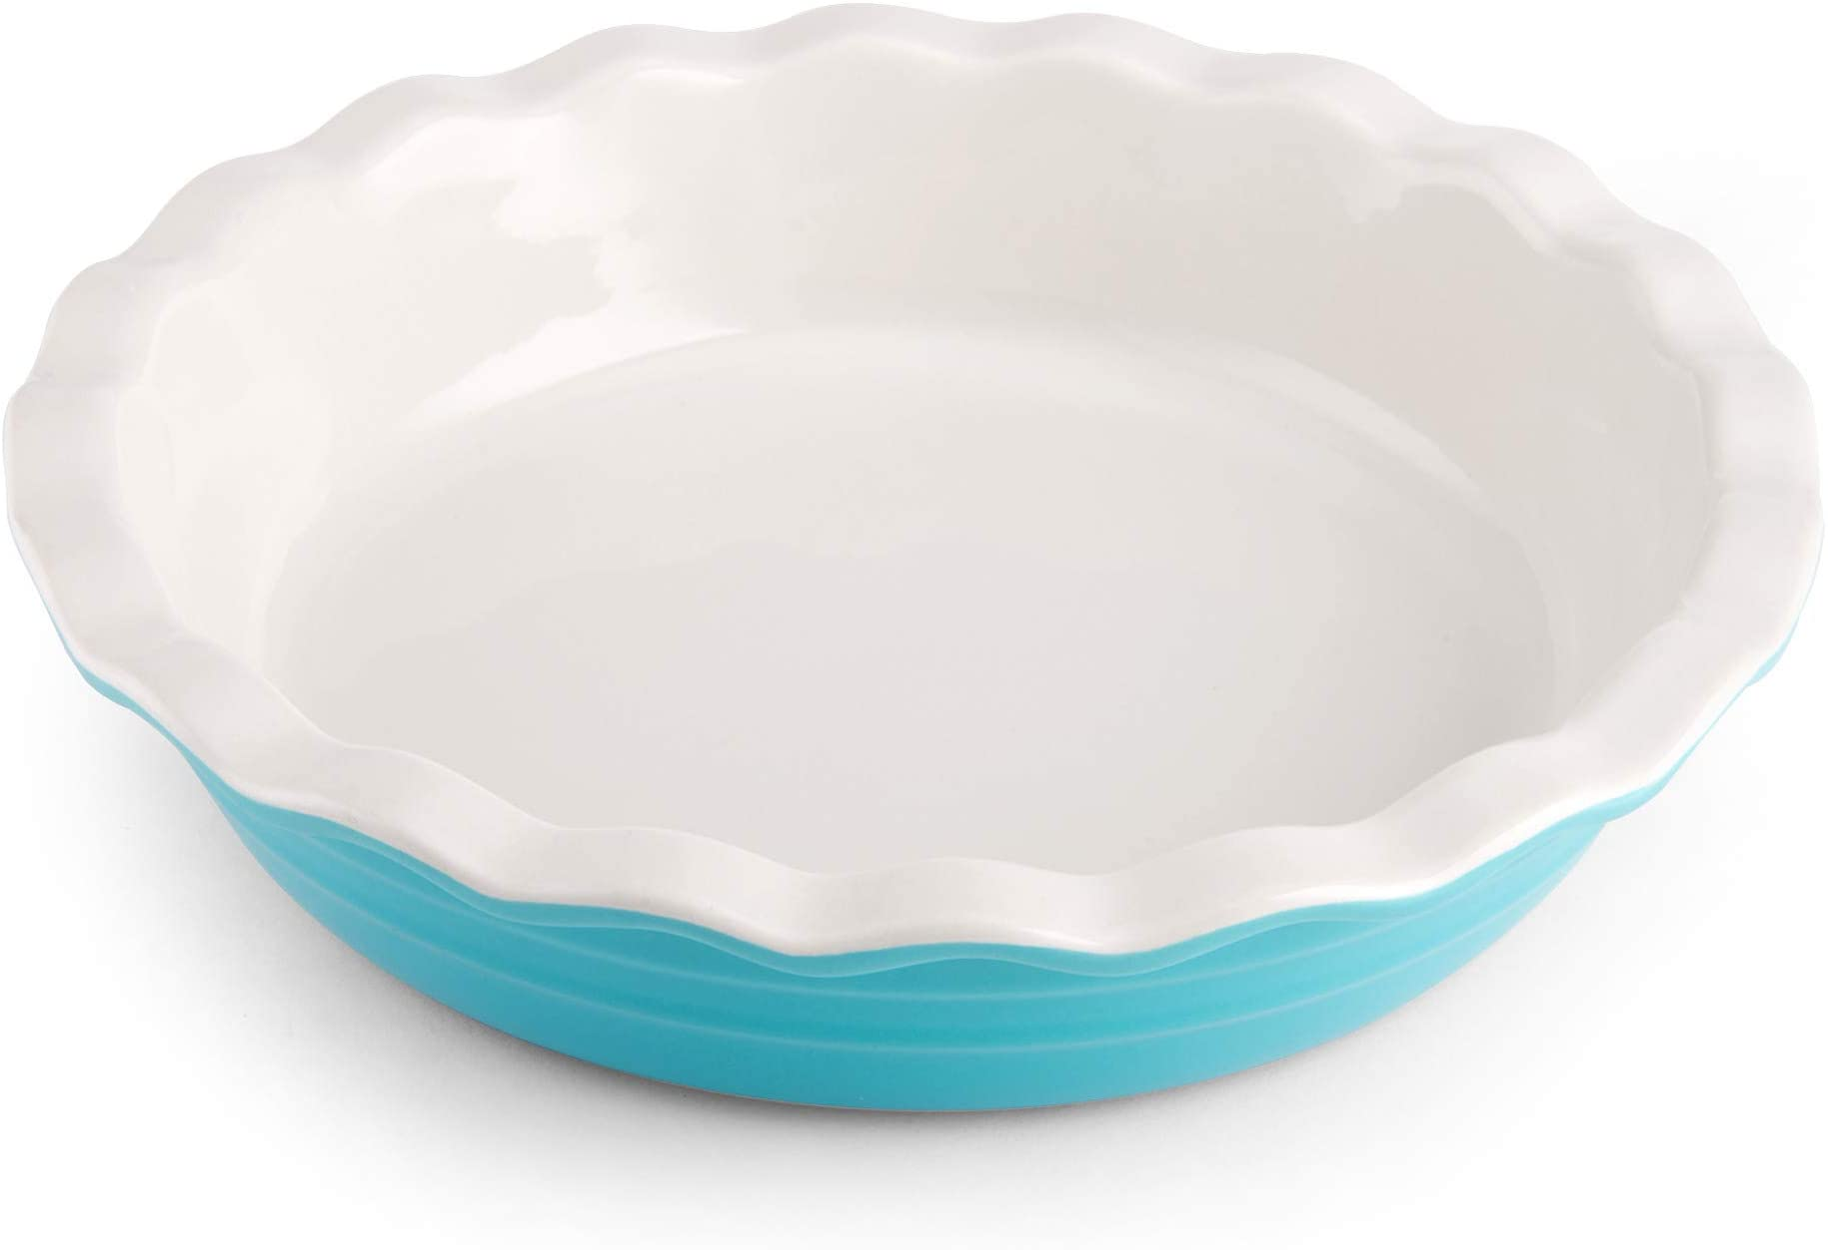 Farberware Baker's Advantage Ceramic Pie Dish, 10-Inch, Teal